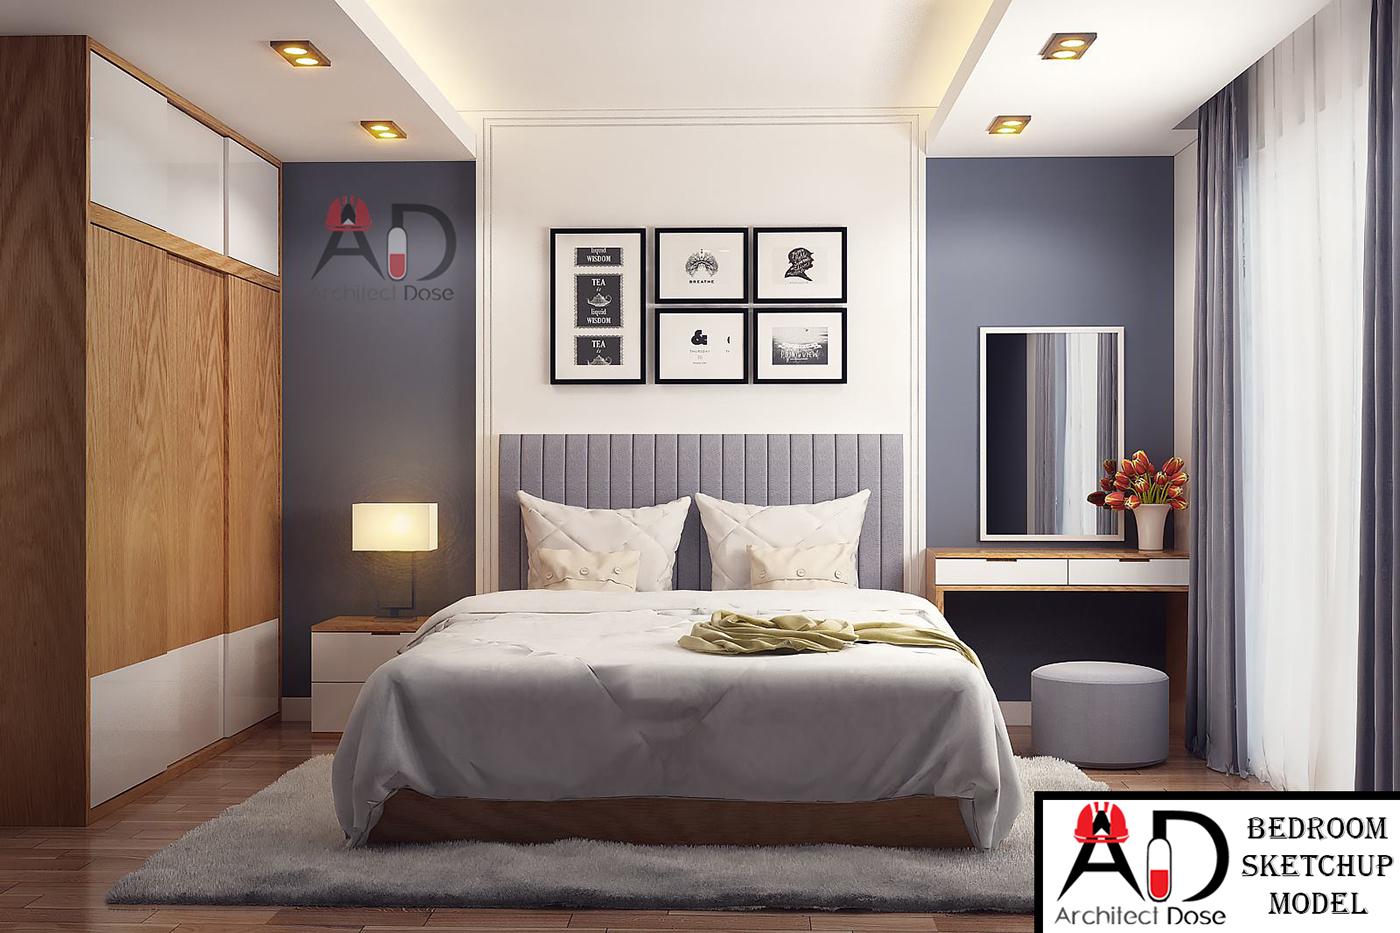 Renders 3d For Master Bedroom Project: Bedroom Sketchup Model On Behance